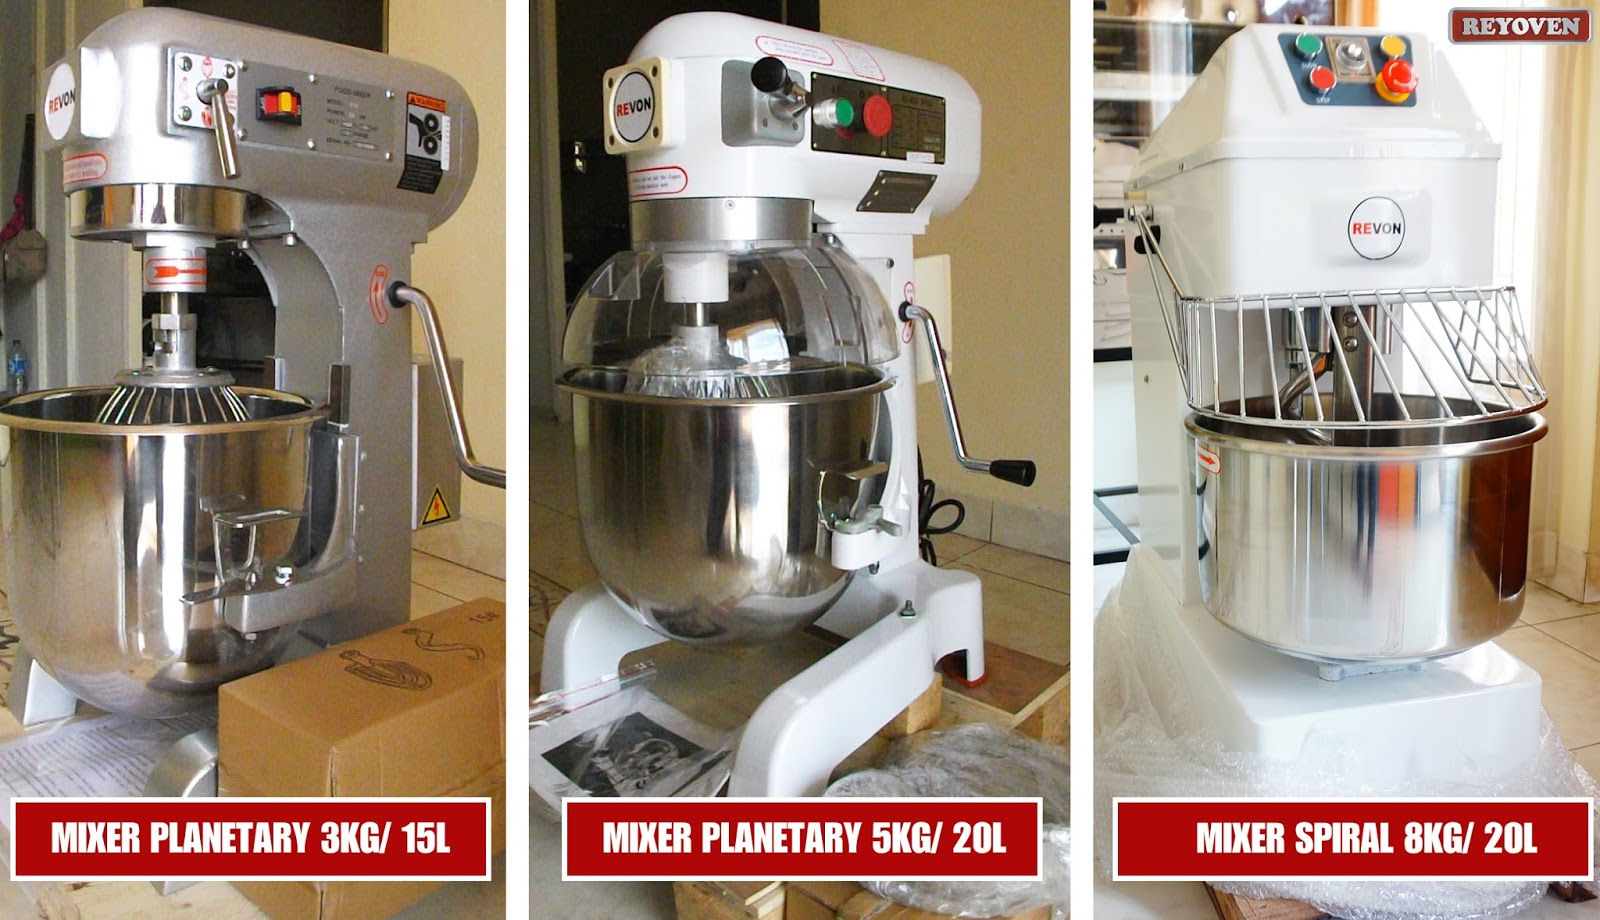 Harga Mixer Roti Murah Di Yogyakarta OVEN GAS NO1 DI